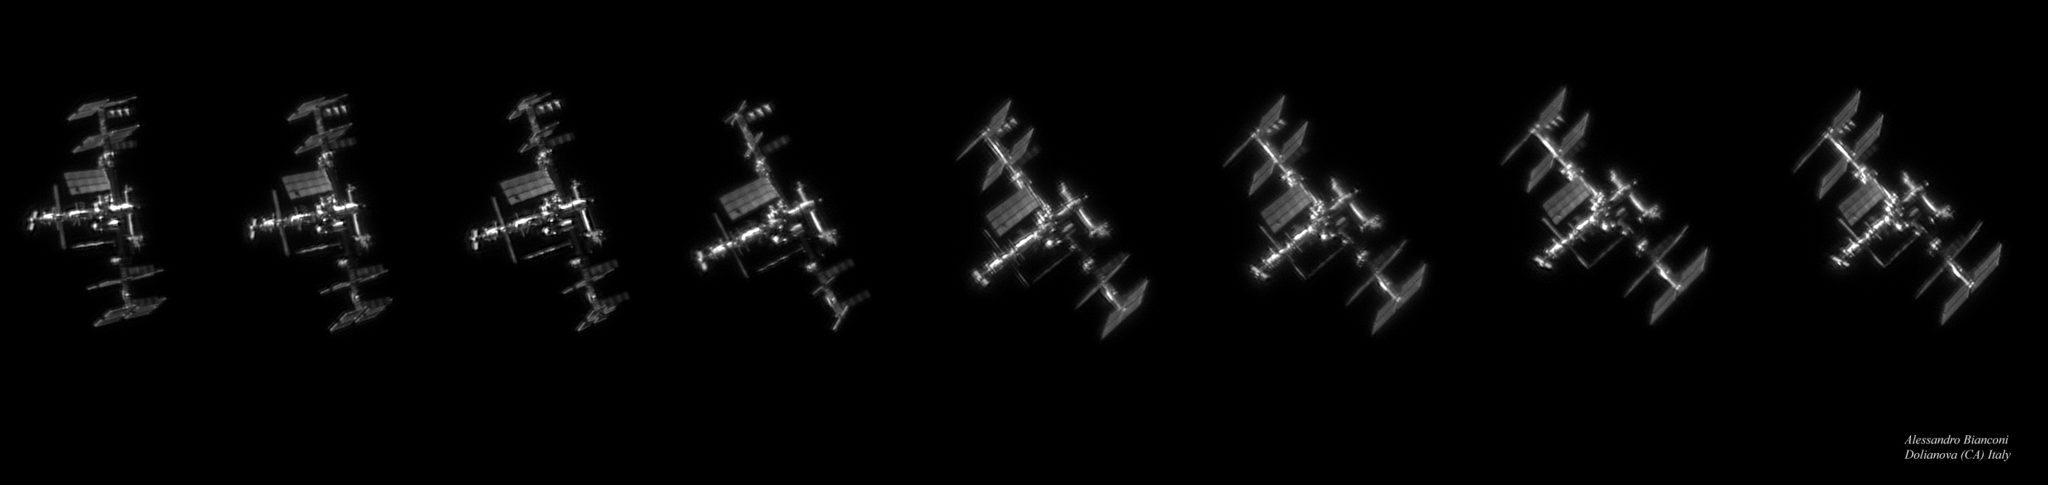 Foto ISS dari bumi dengan resolusi tinggi diambil oleh Alessandro Bianconi pada Oktober 2017. Bentuk ISS dan detilnya terlihatjelas dalam foto melalui teleskop dari bumi ini.